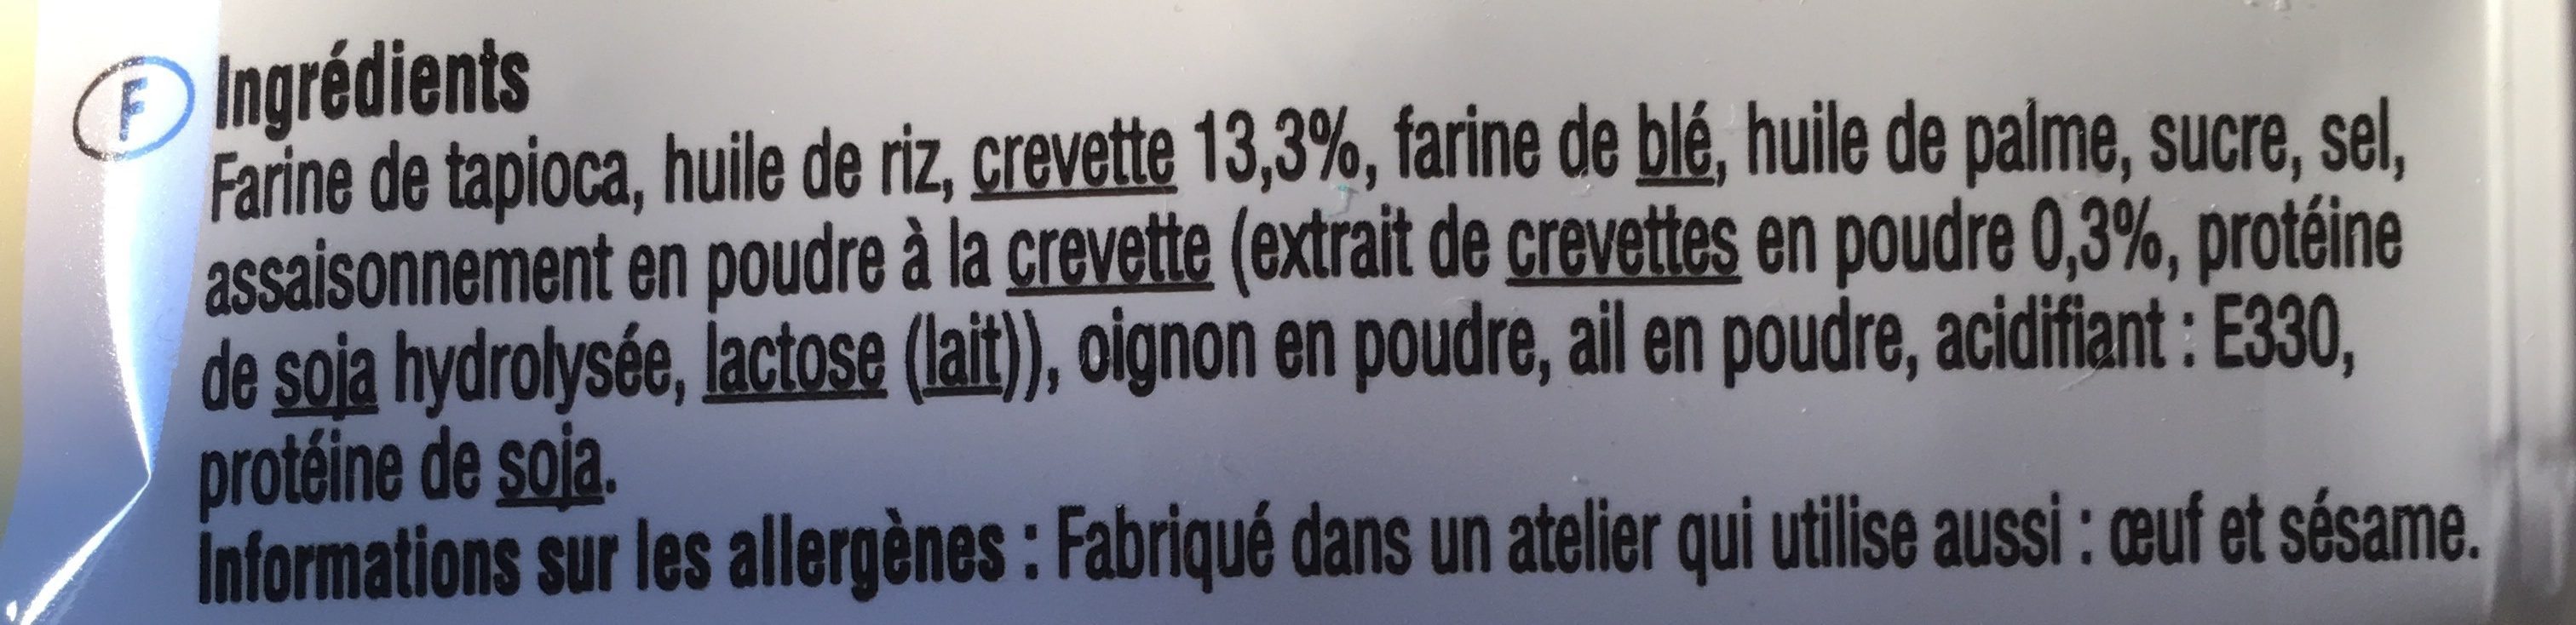 Chips de crevettes - Ingredients - fr